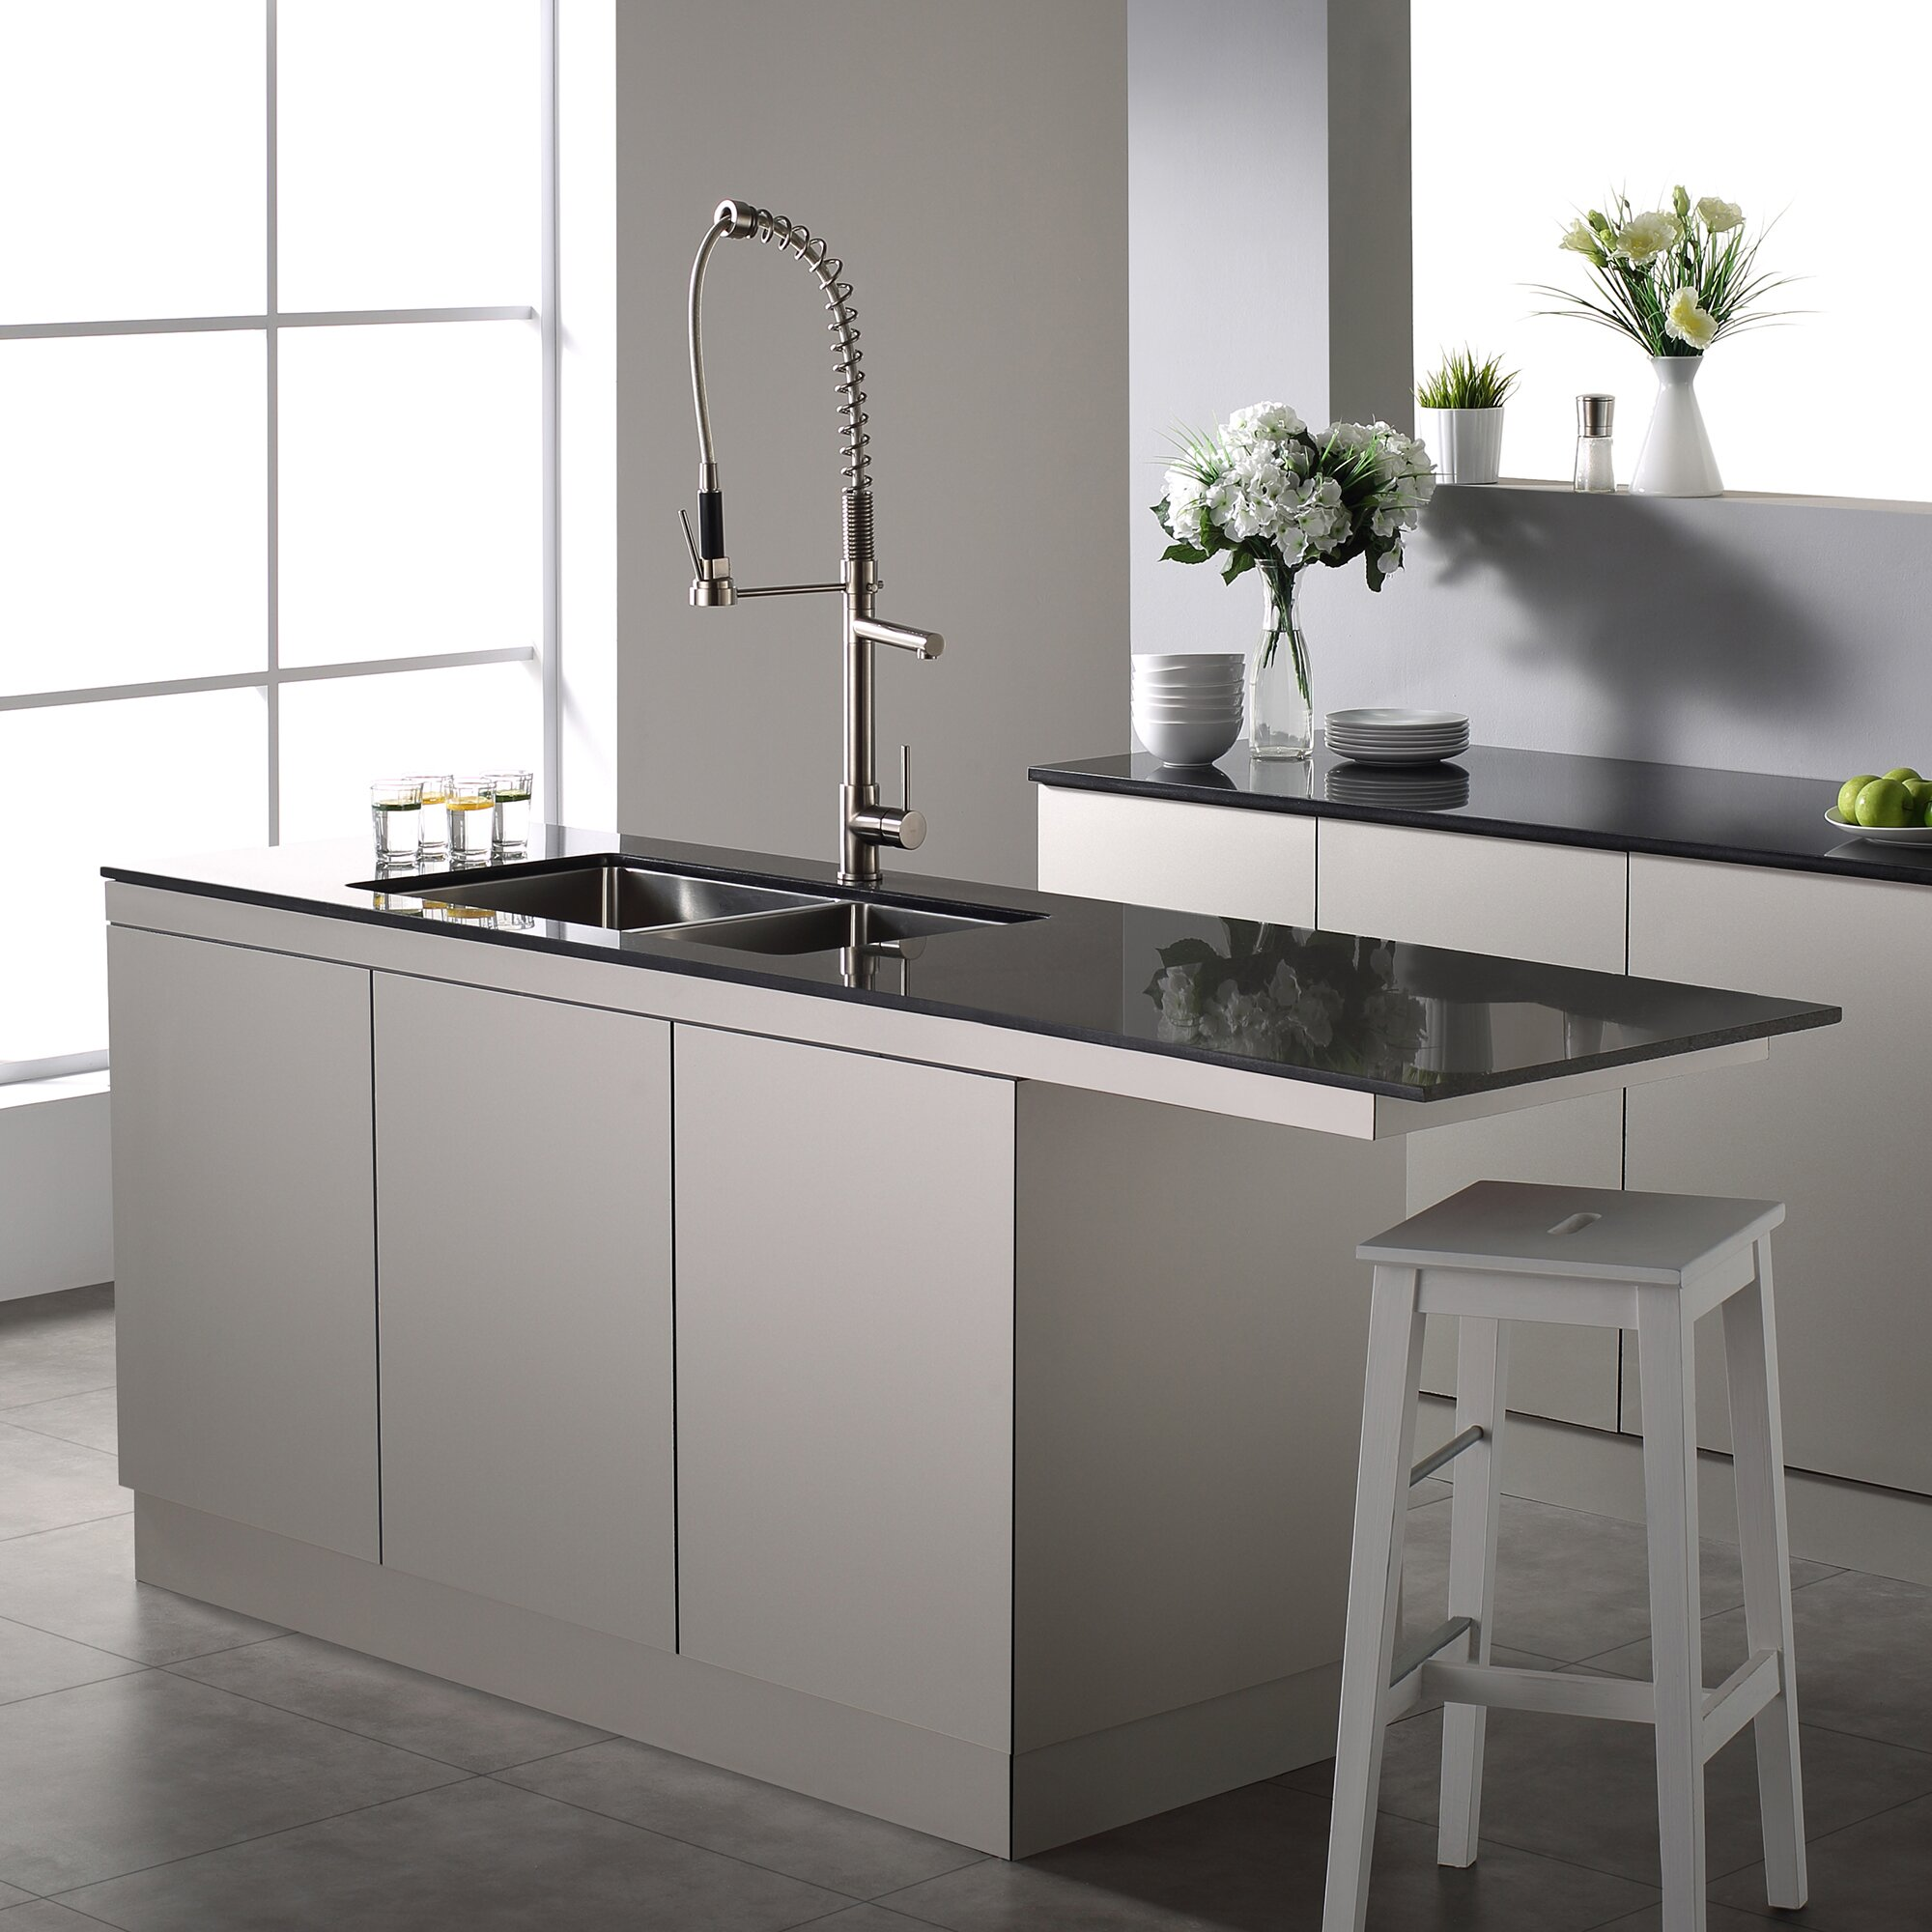 ... 40 Double Bowl 16 Gauge Stainless Steel Kitchen Sink Wayfair Supply